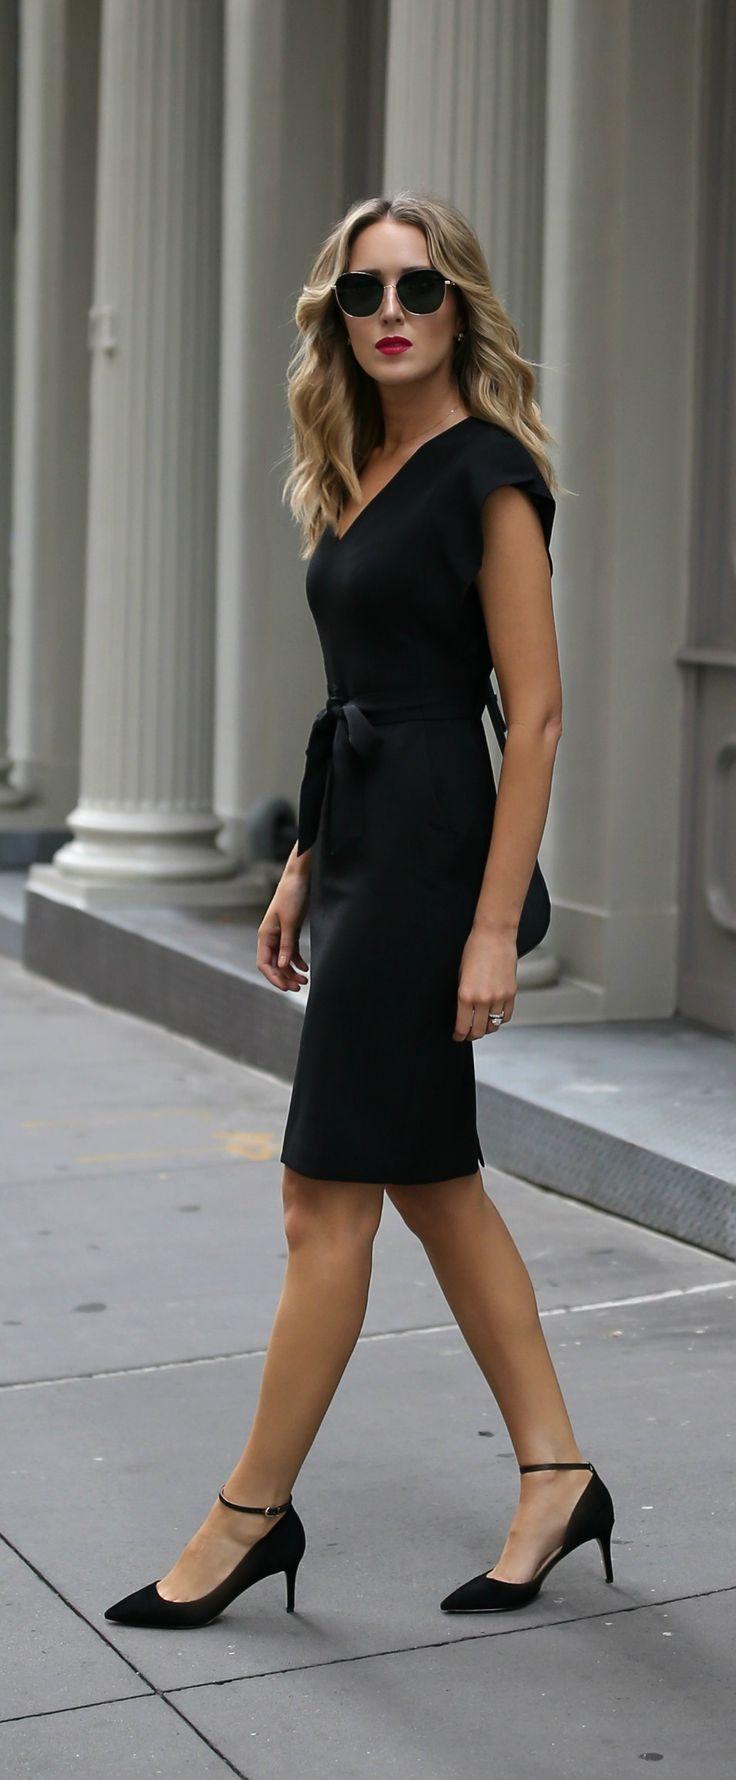 Black dress office - Classic Black Sheath Dress Ankle Strap Black Pumps Eliza J Sam Edelman